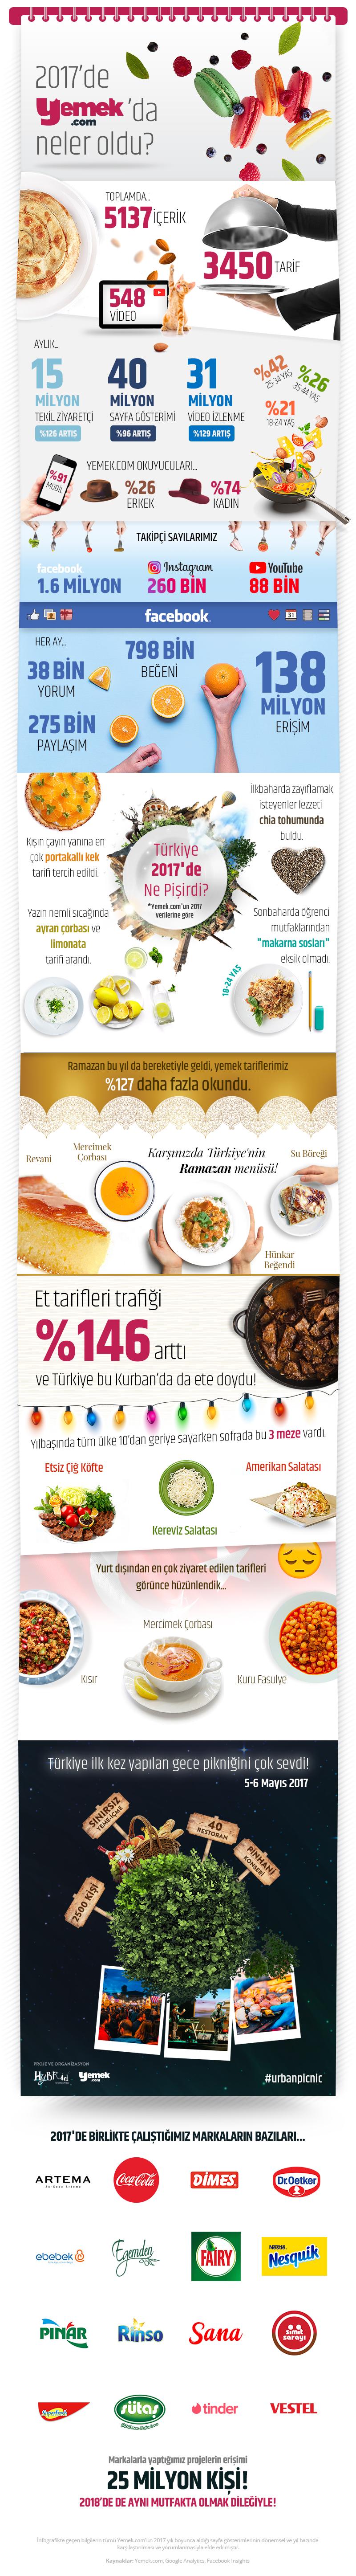 yemekcom-infografik-2017